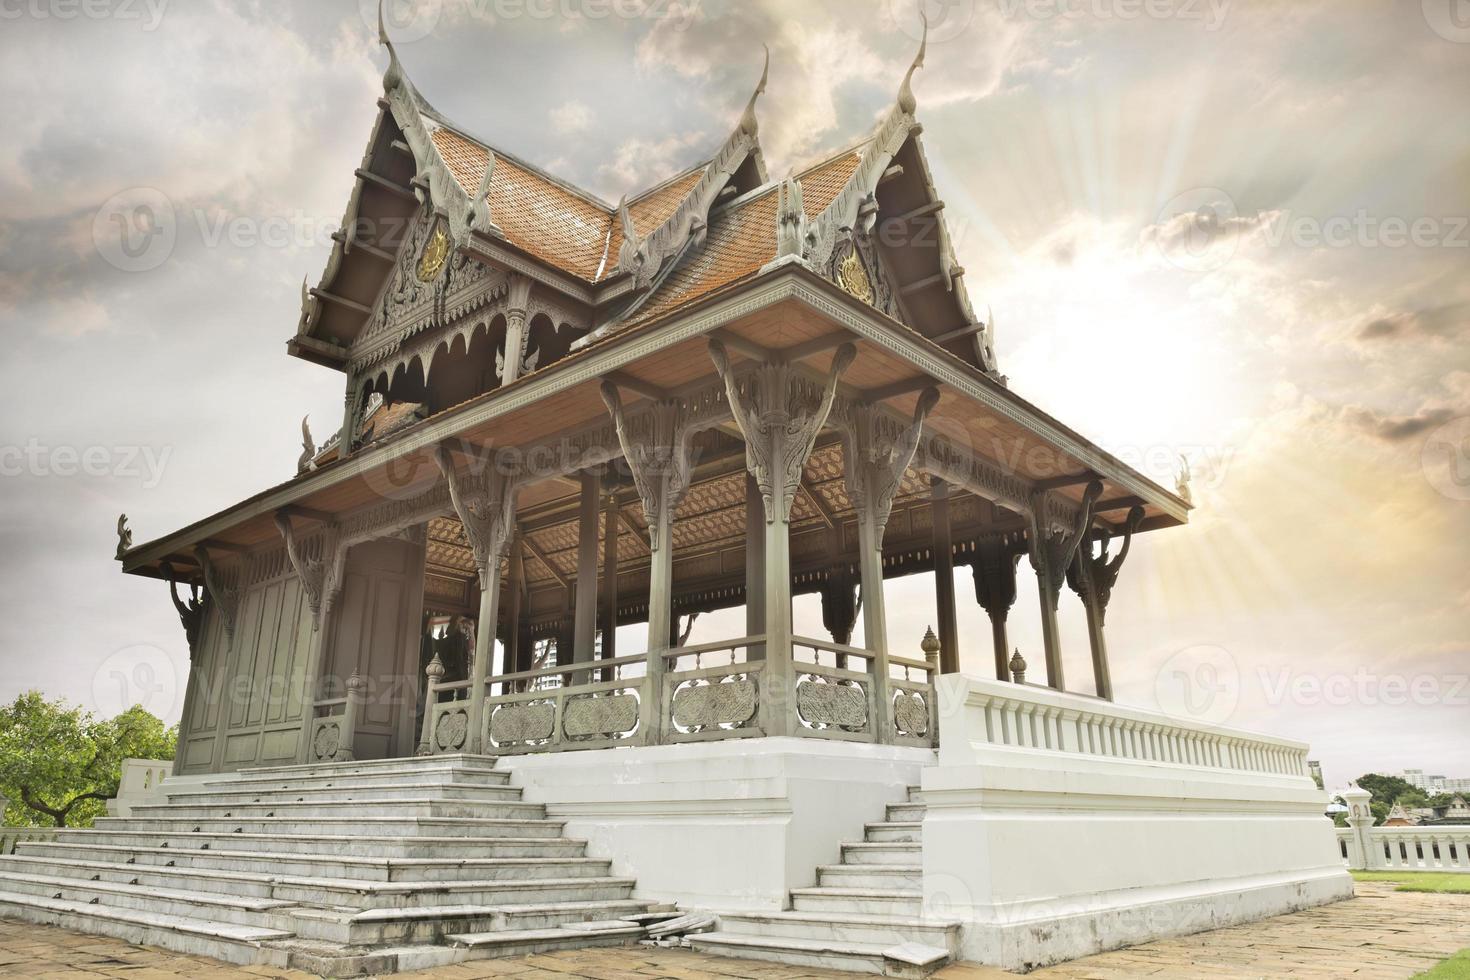 antigo palácio real tailandês no jardim foto